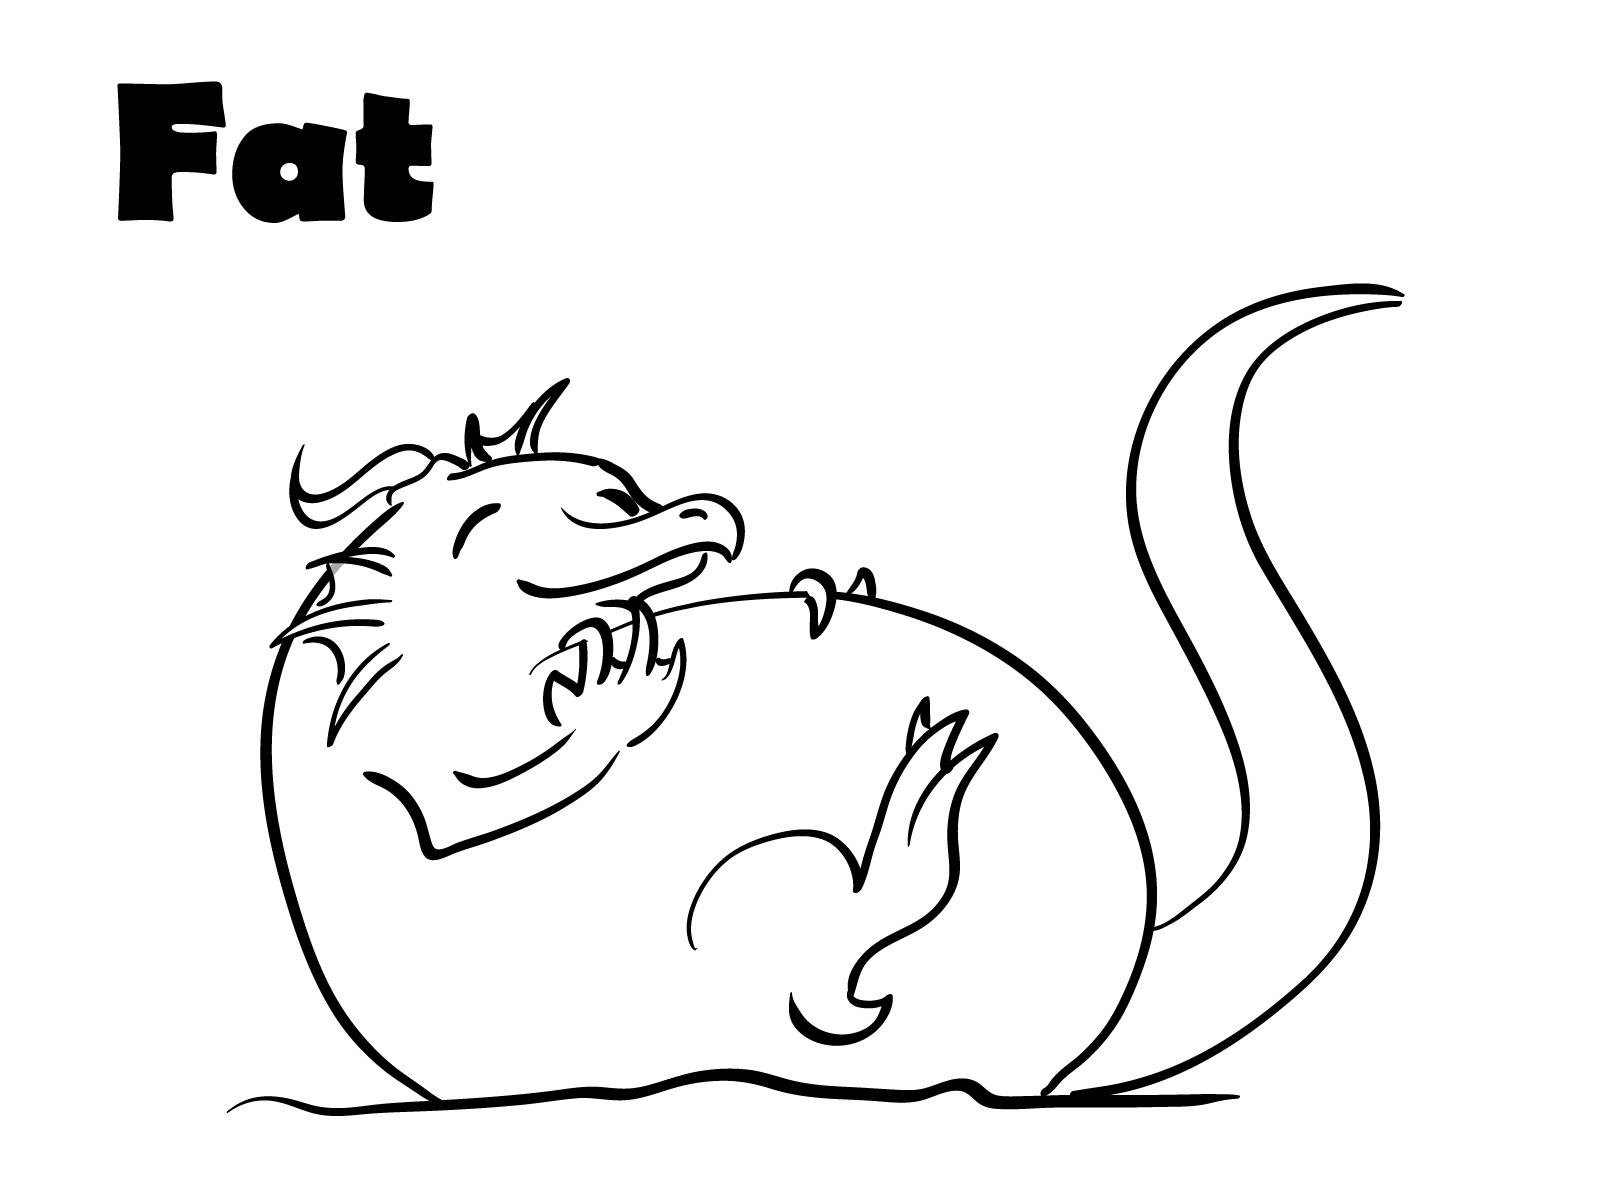 16-Fat.jpg